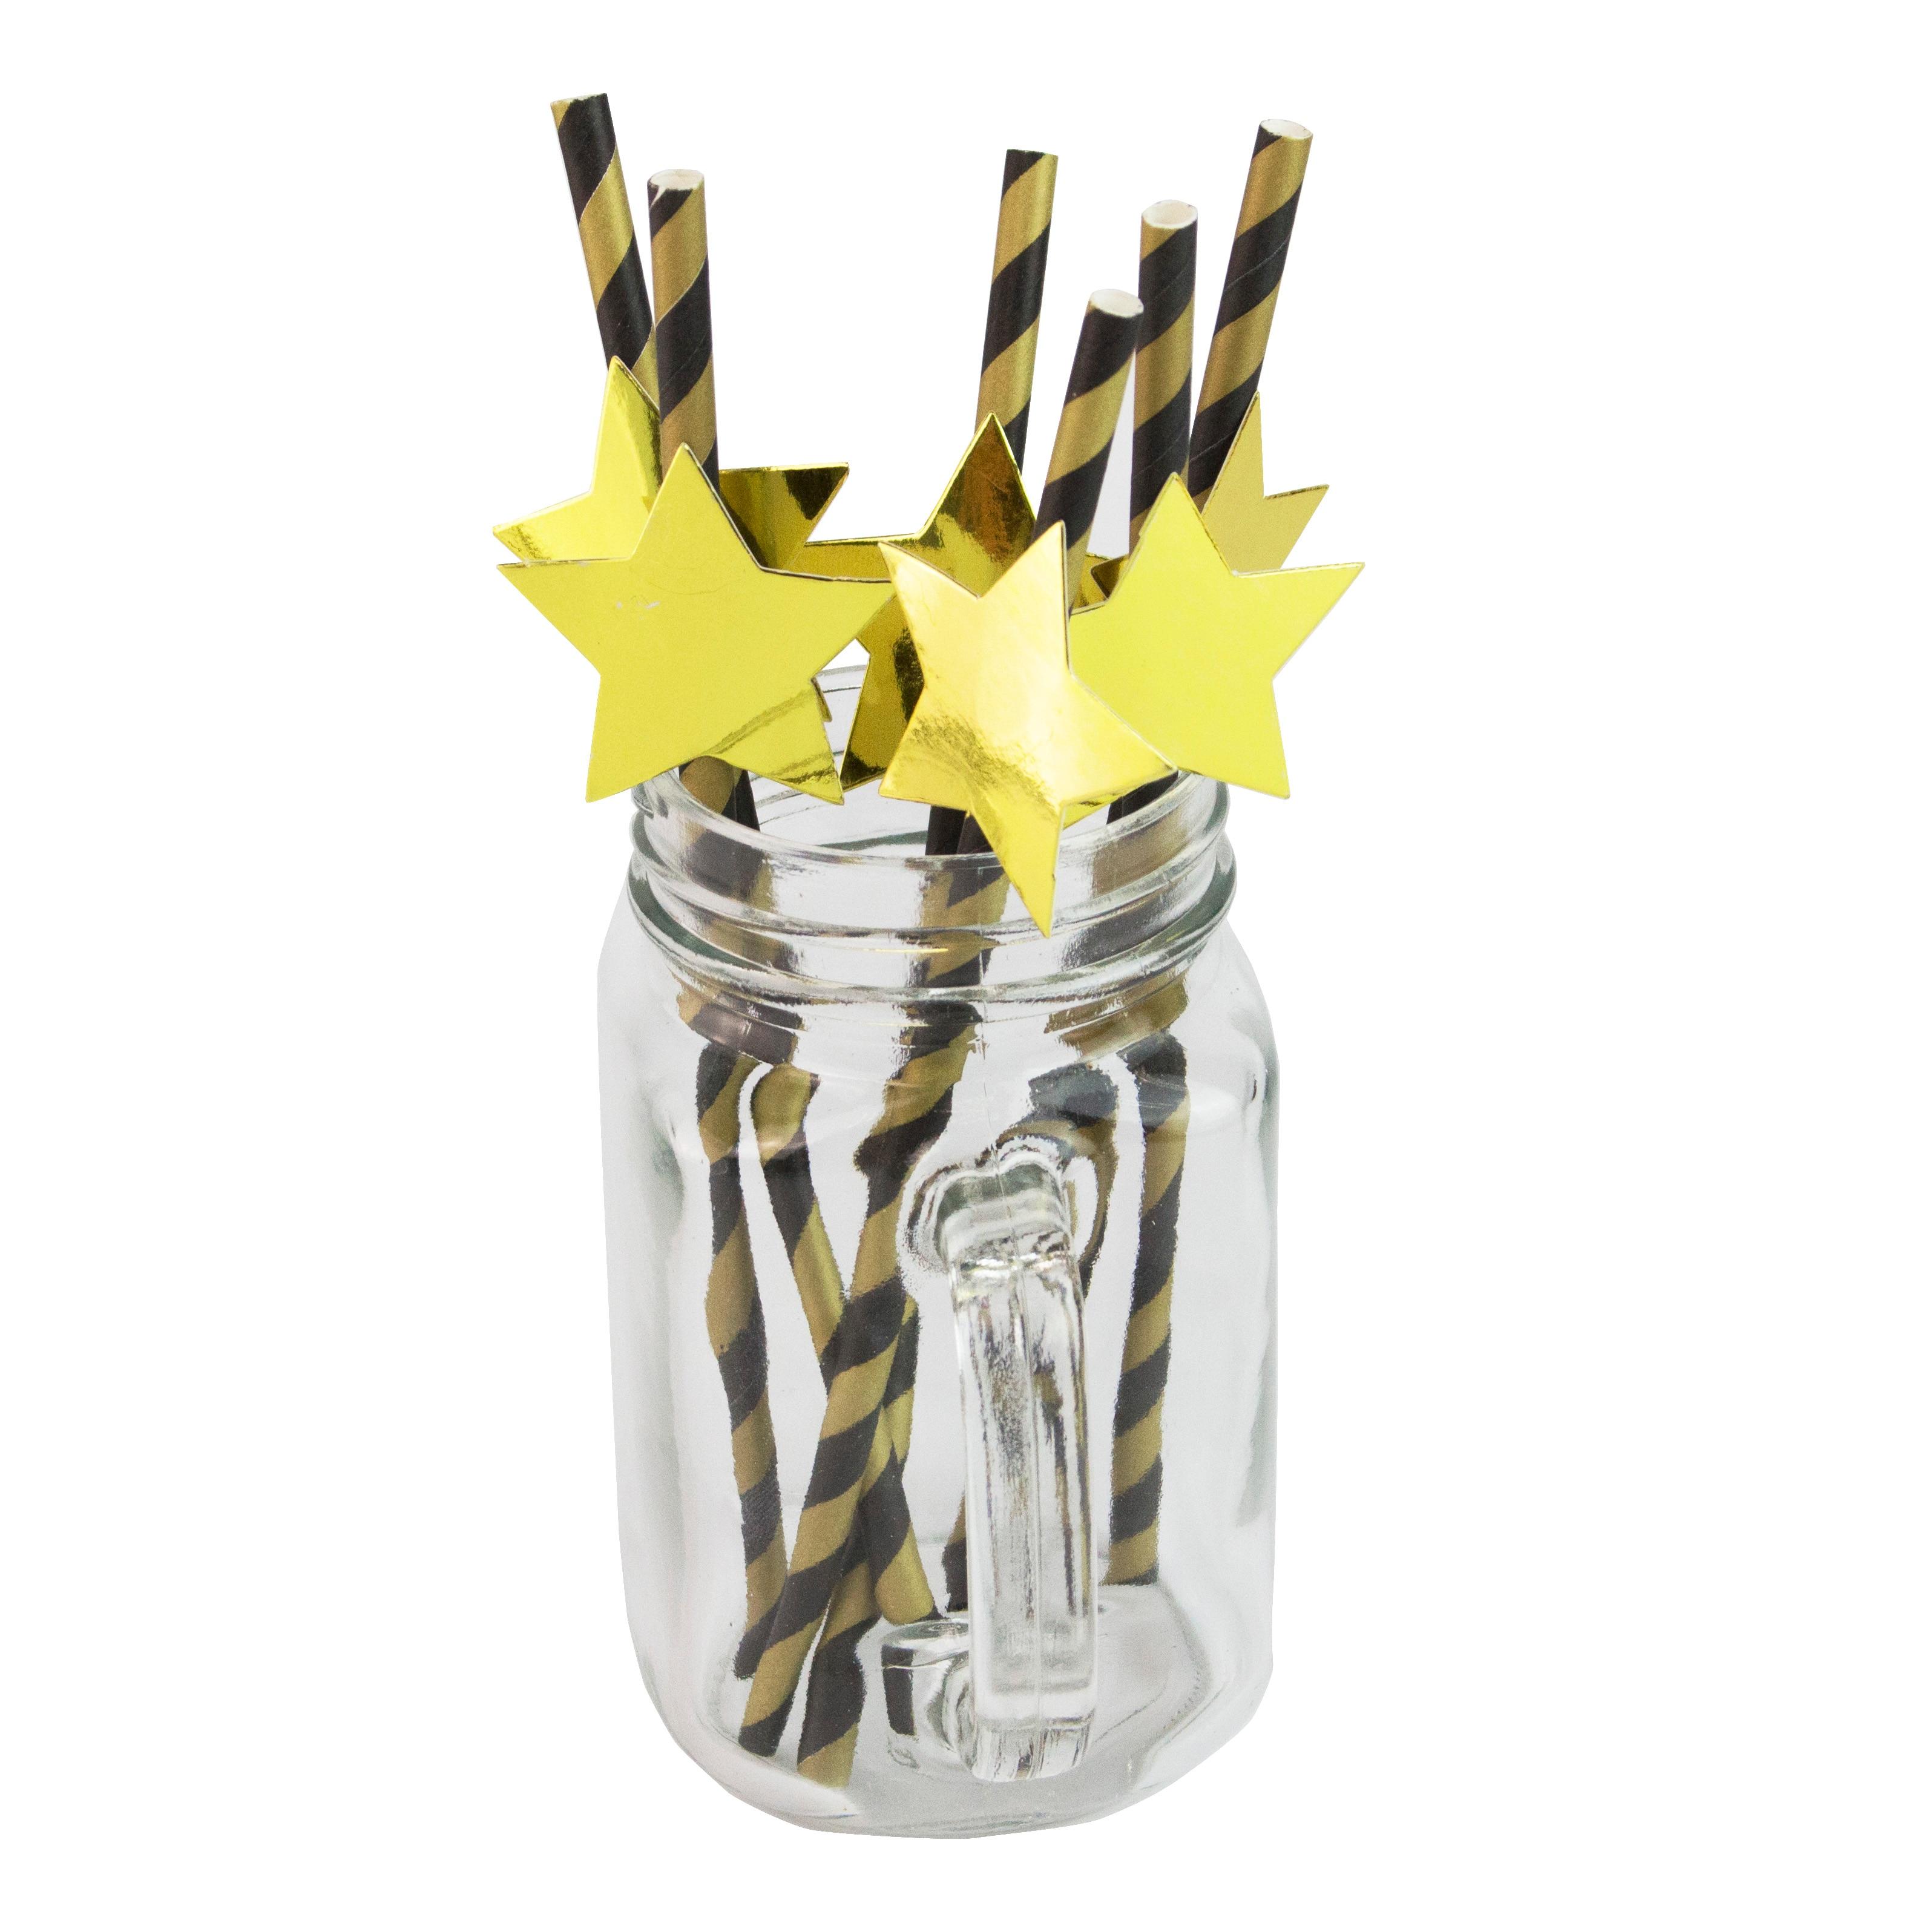 Envío Gratis 10000 Uds negro Superstar rayas pajitas de papel estrella pajita lol sorpresas fiesta